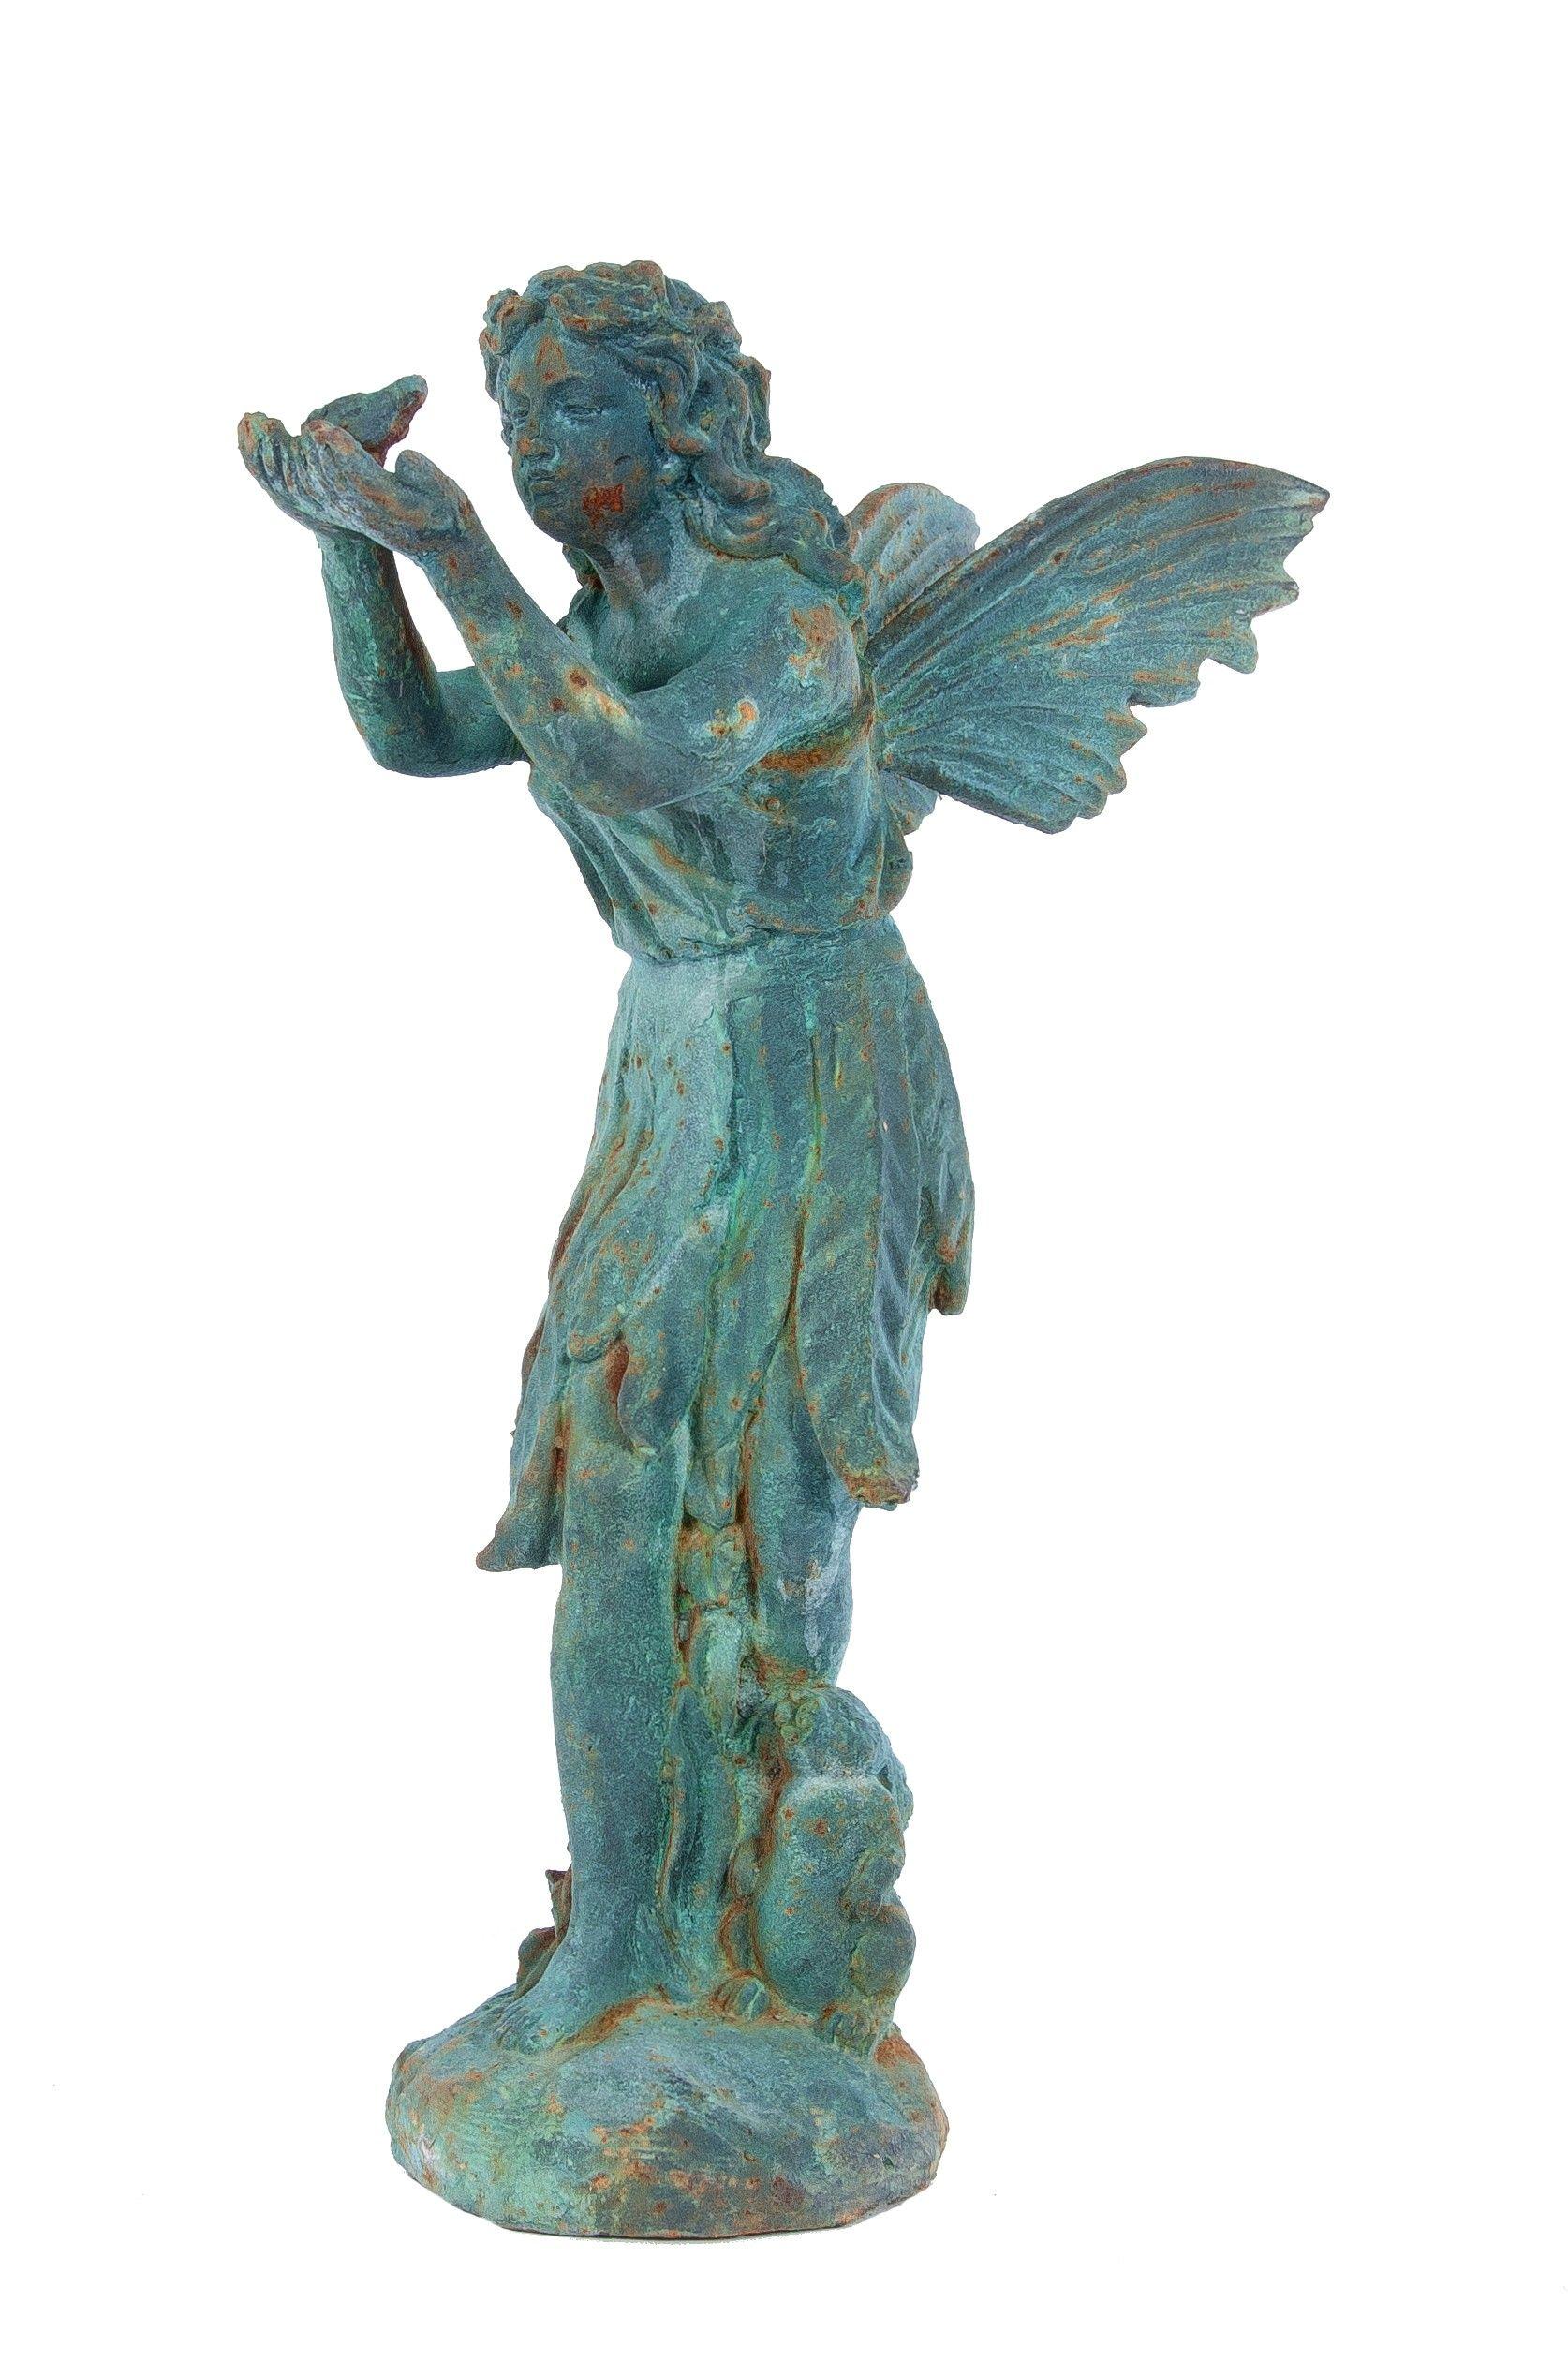 Fairy garden ornaments - Fairy Garden Ornaments